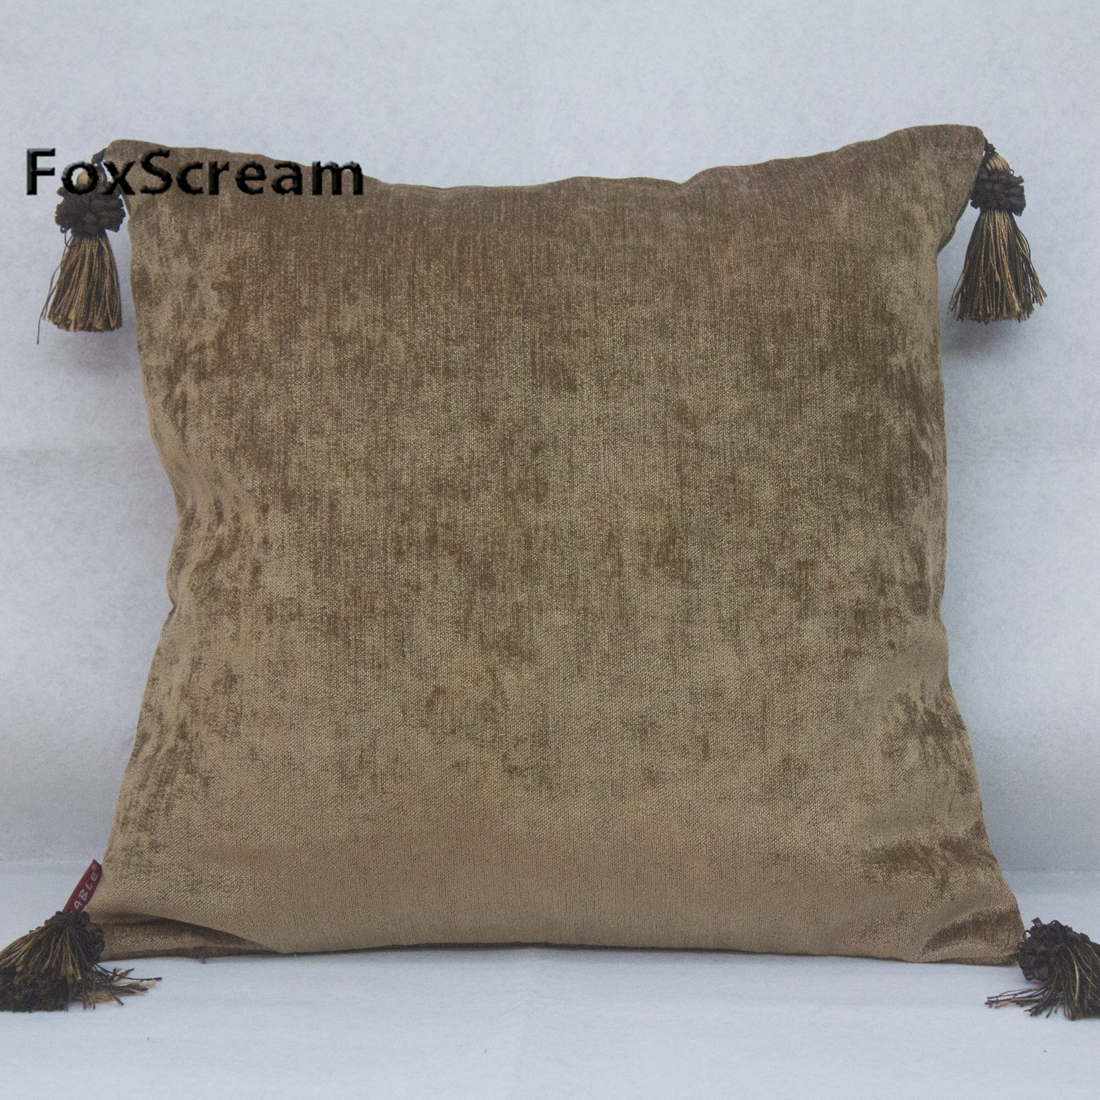 Chairfx Chair Covers Eu Best Big And Tall Beach European Decorative Throw Pillowcase Solid Purple Gray